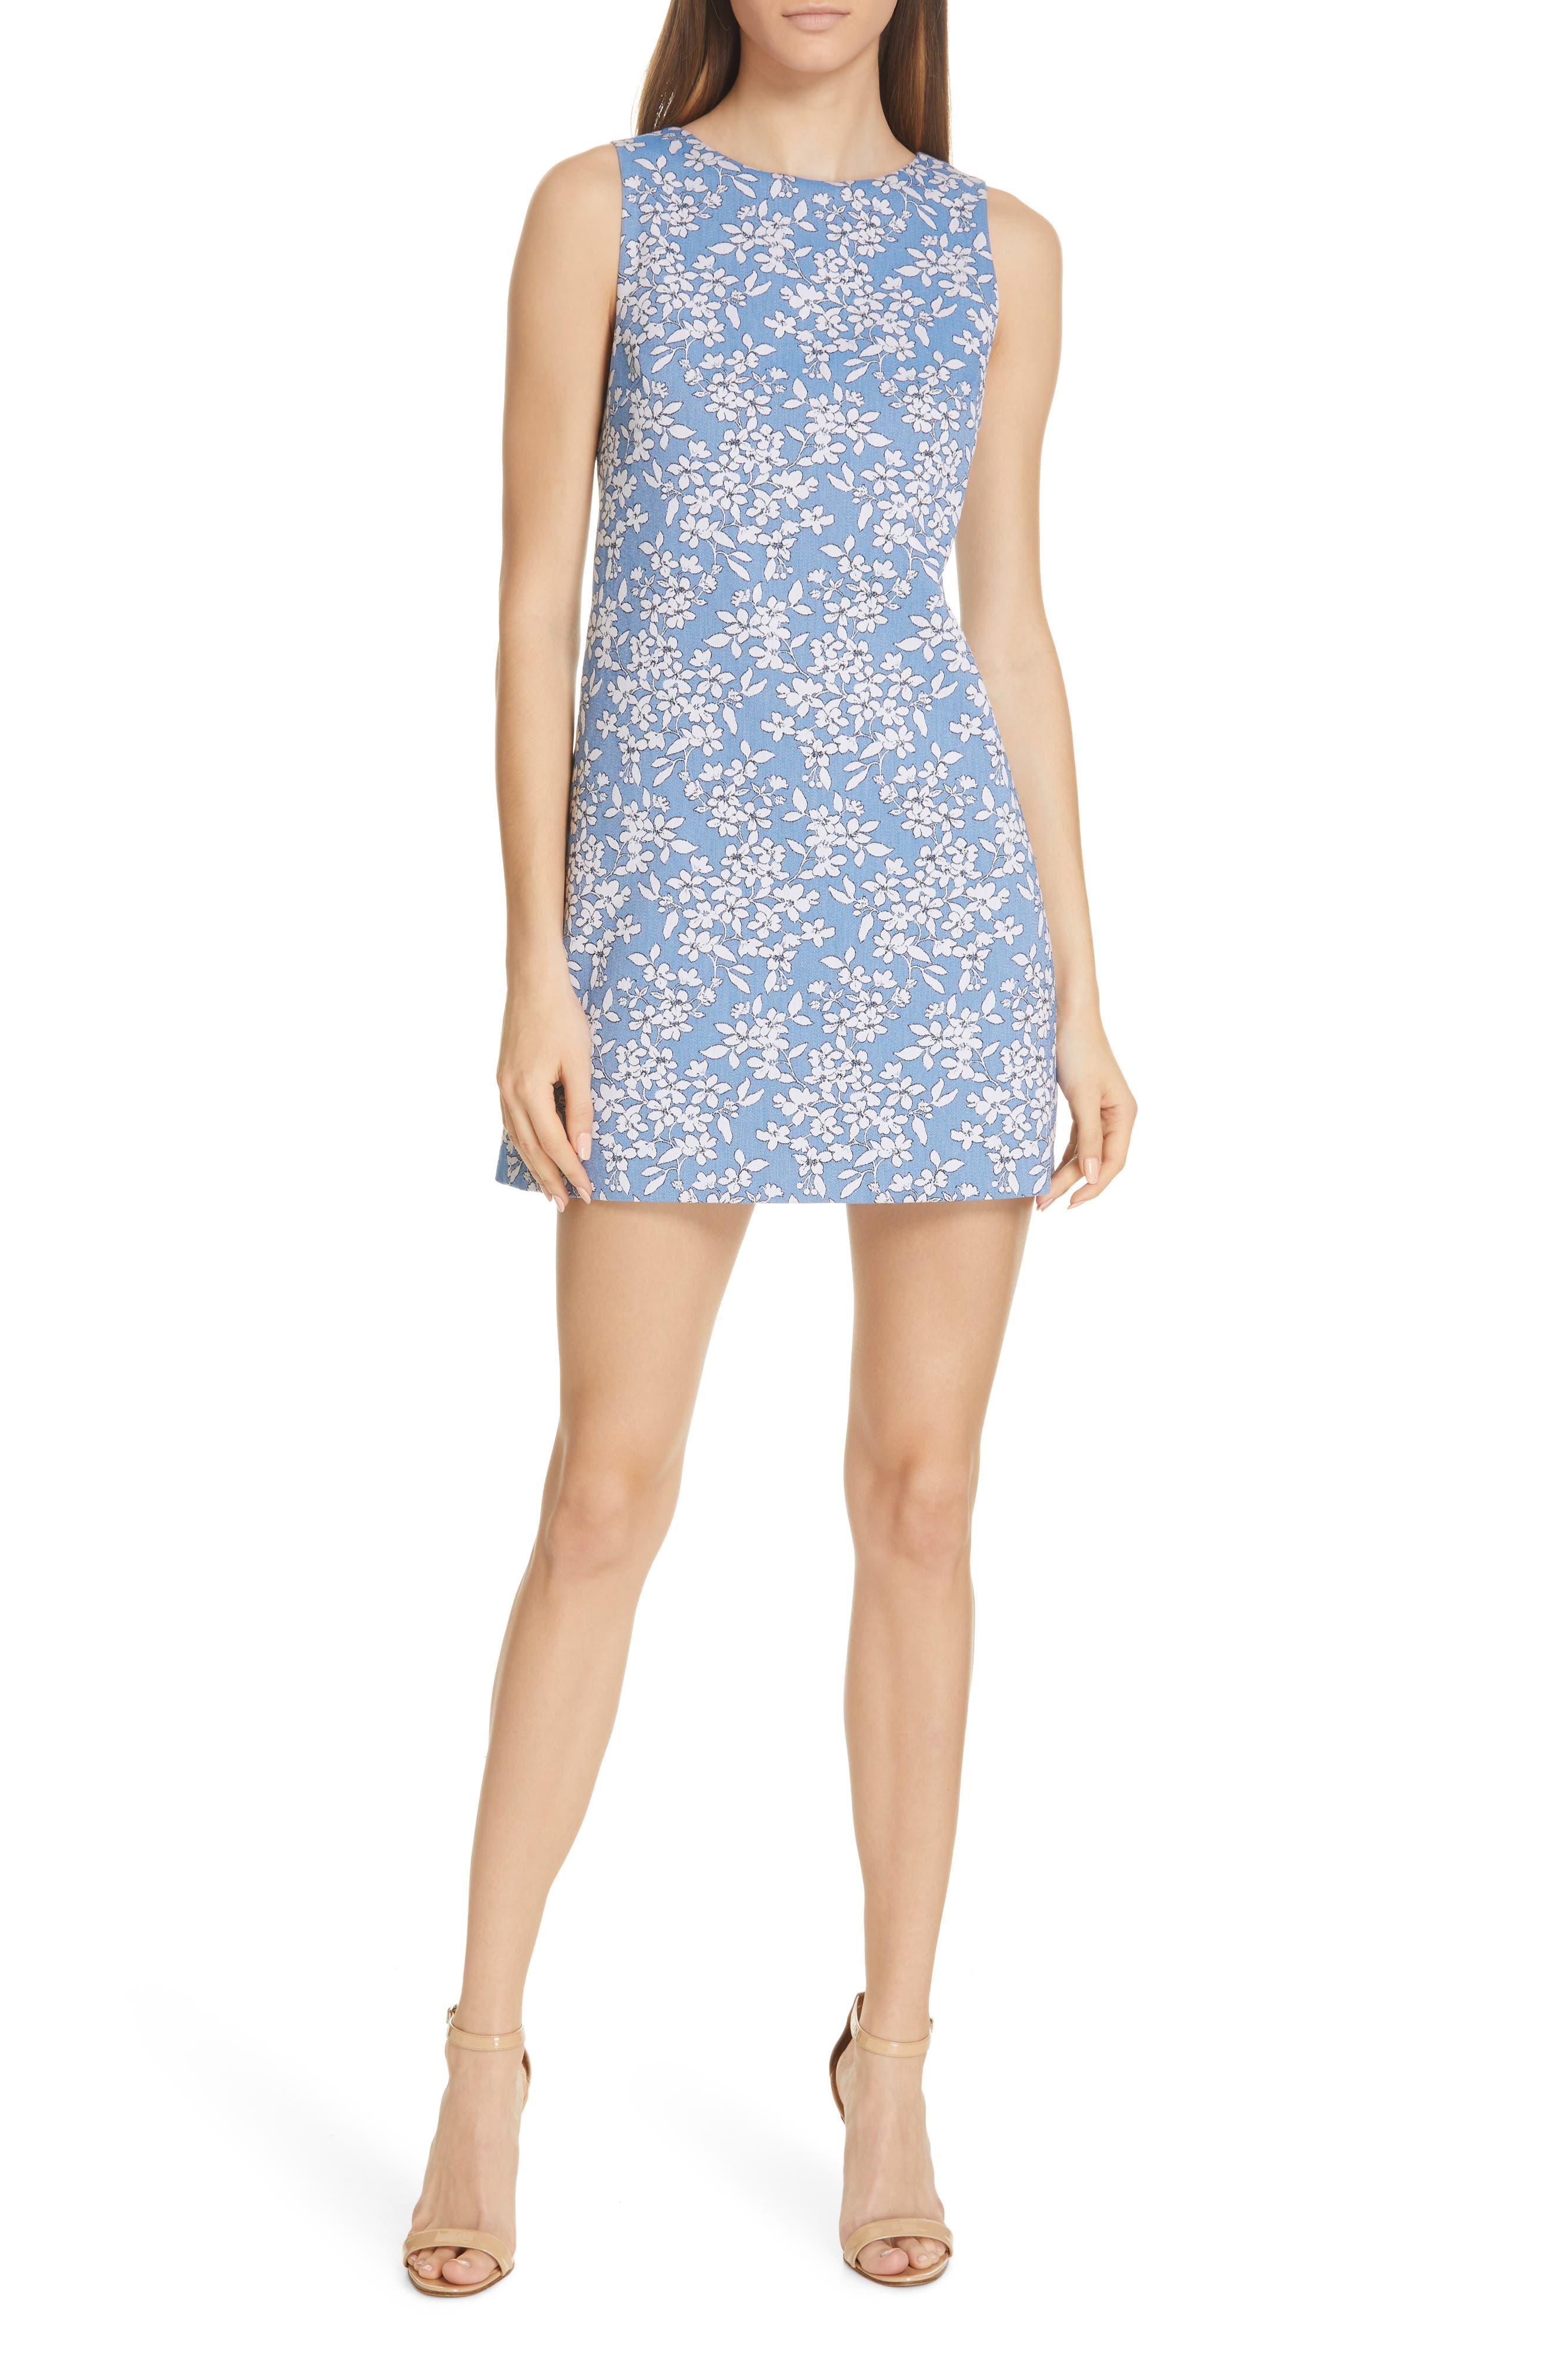 Alice + Olivia Clyde A-Line Minidress, Blue